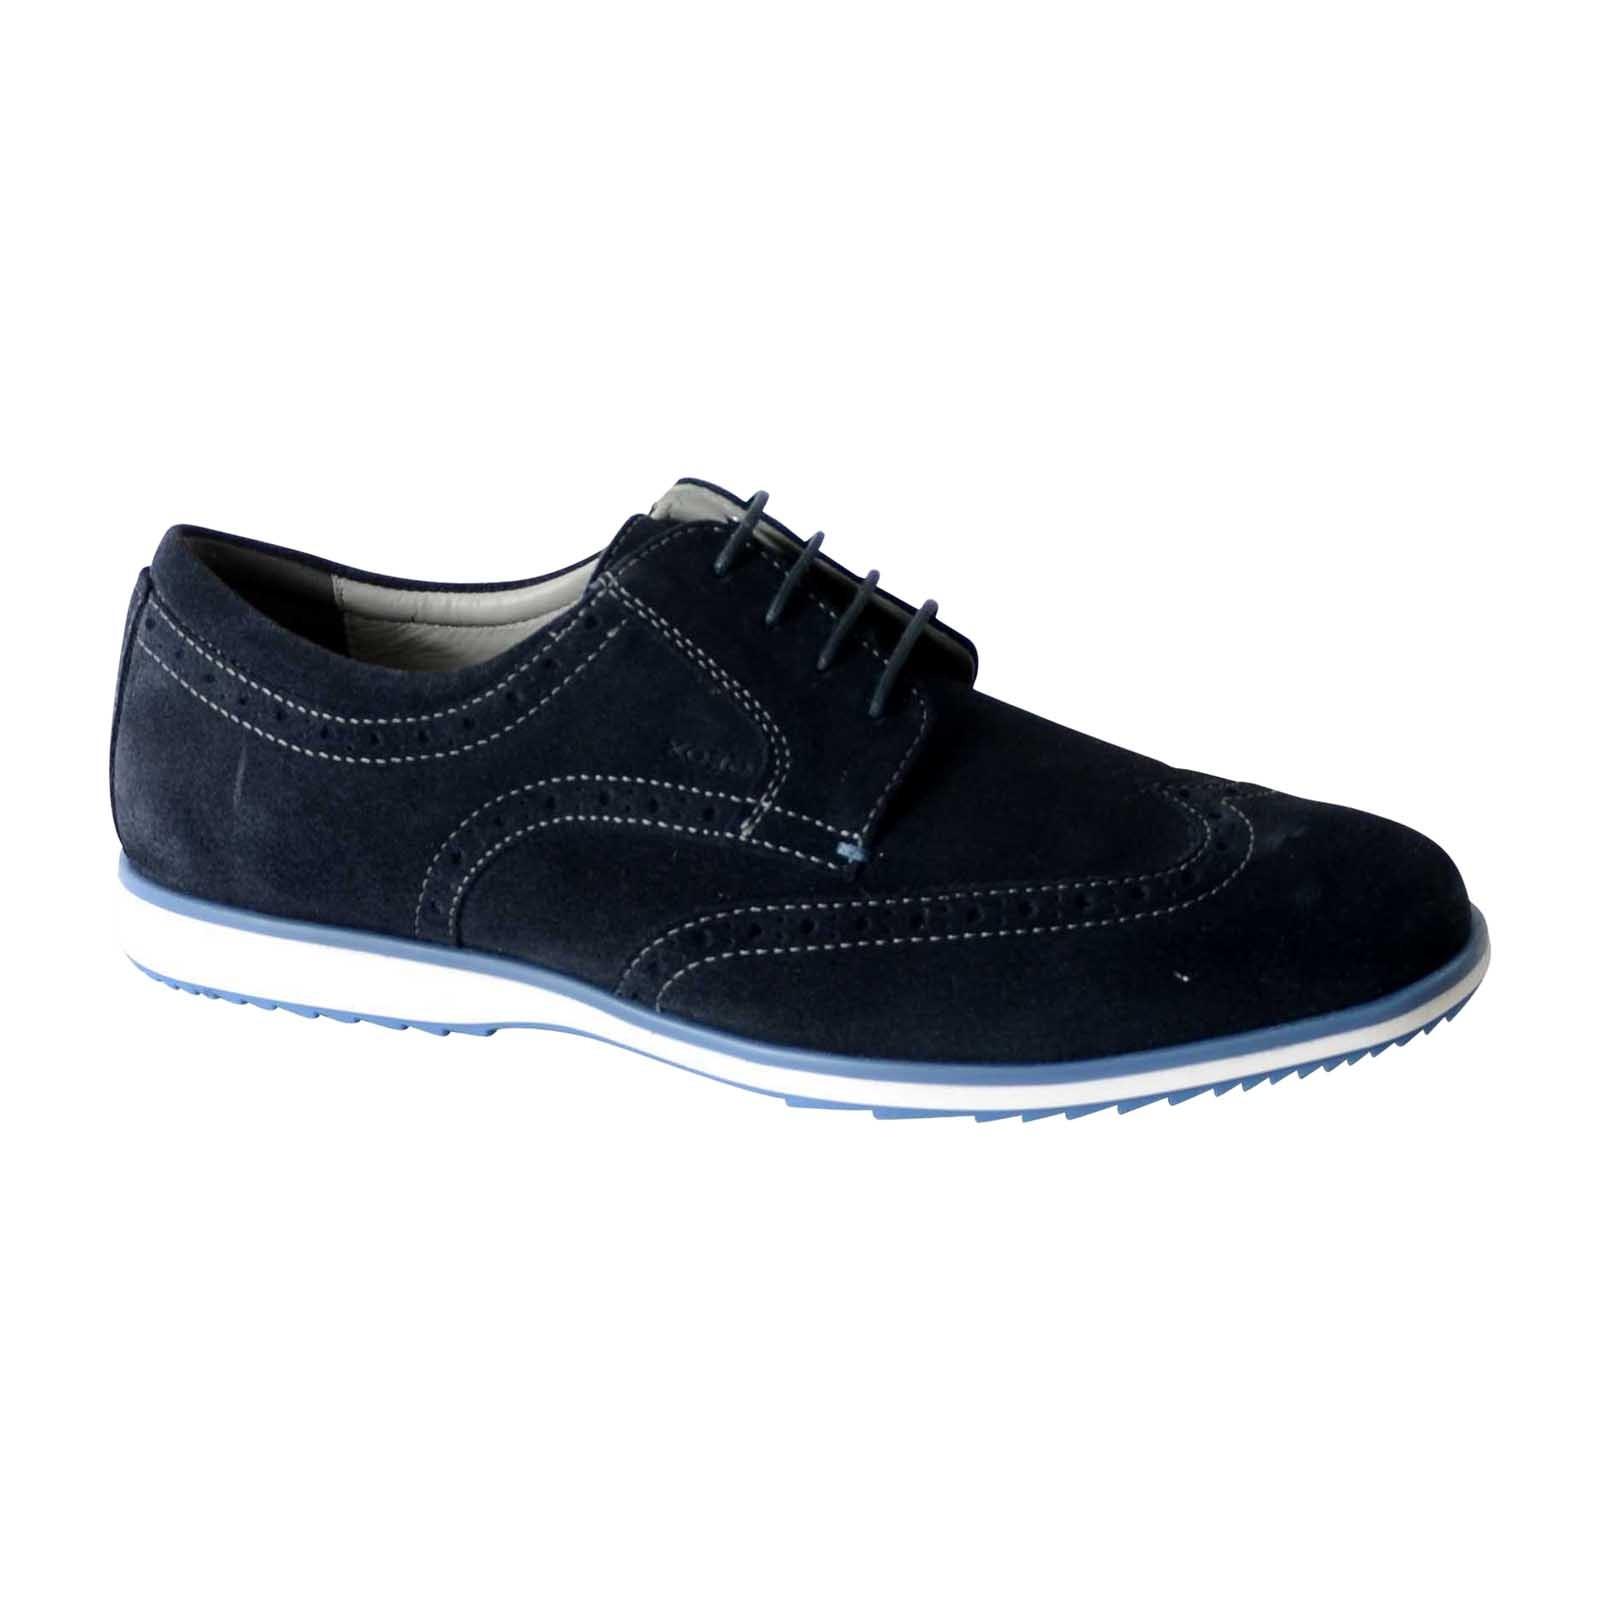 Chaussure-Geox-U-BLAINEY-A-SUEDE miniature 4